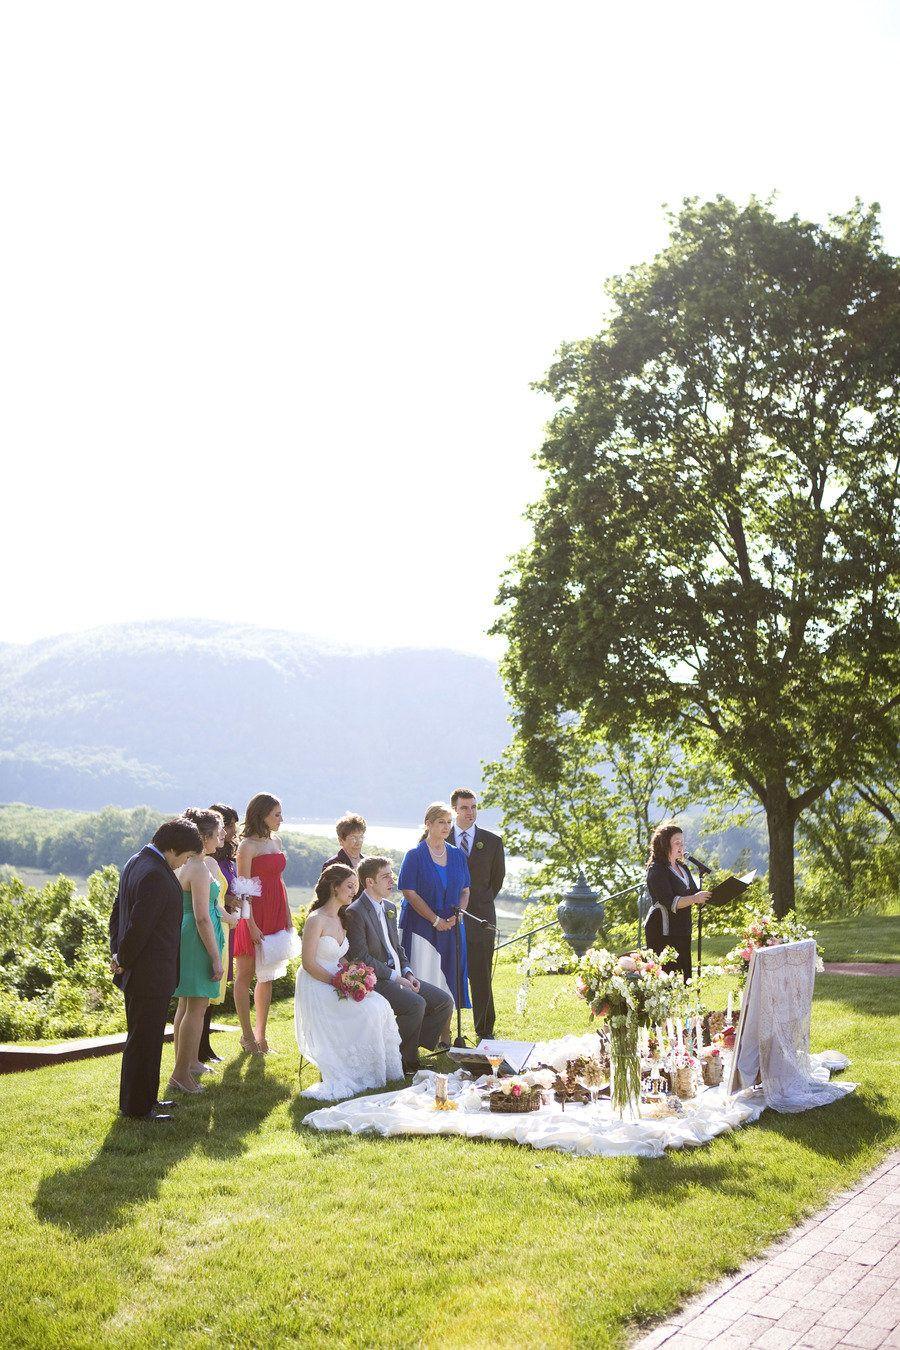 Boscobel House Gardens Wedding By Alyssa Rose Photography Rose Photography Photography Garden Wedding